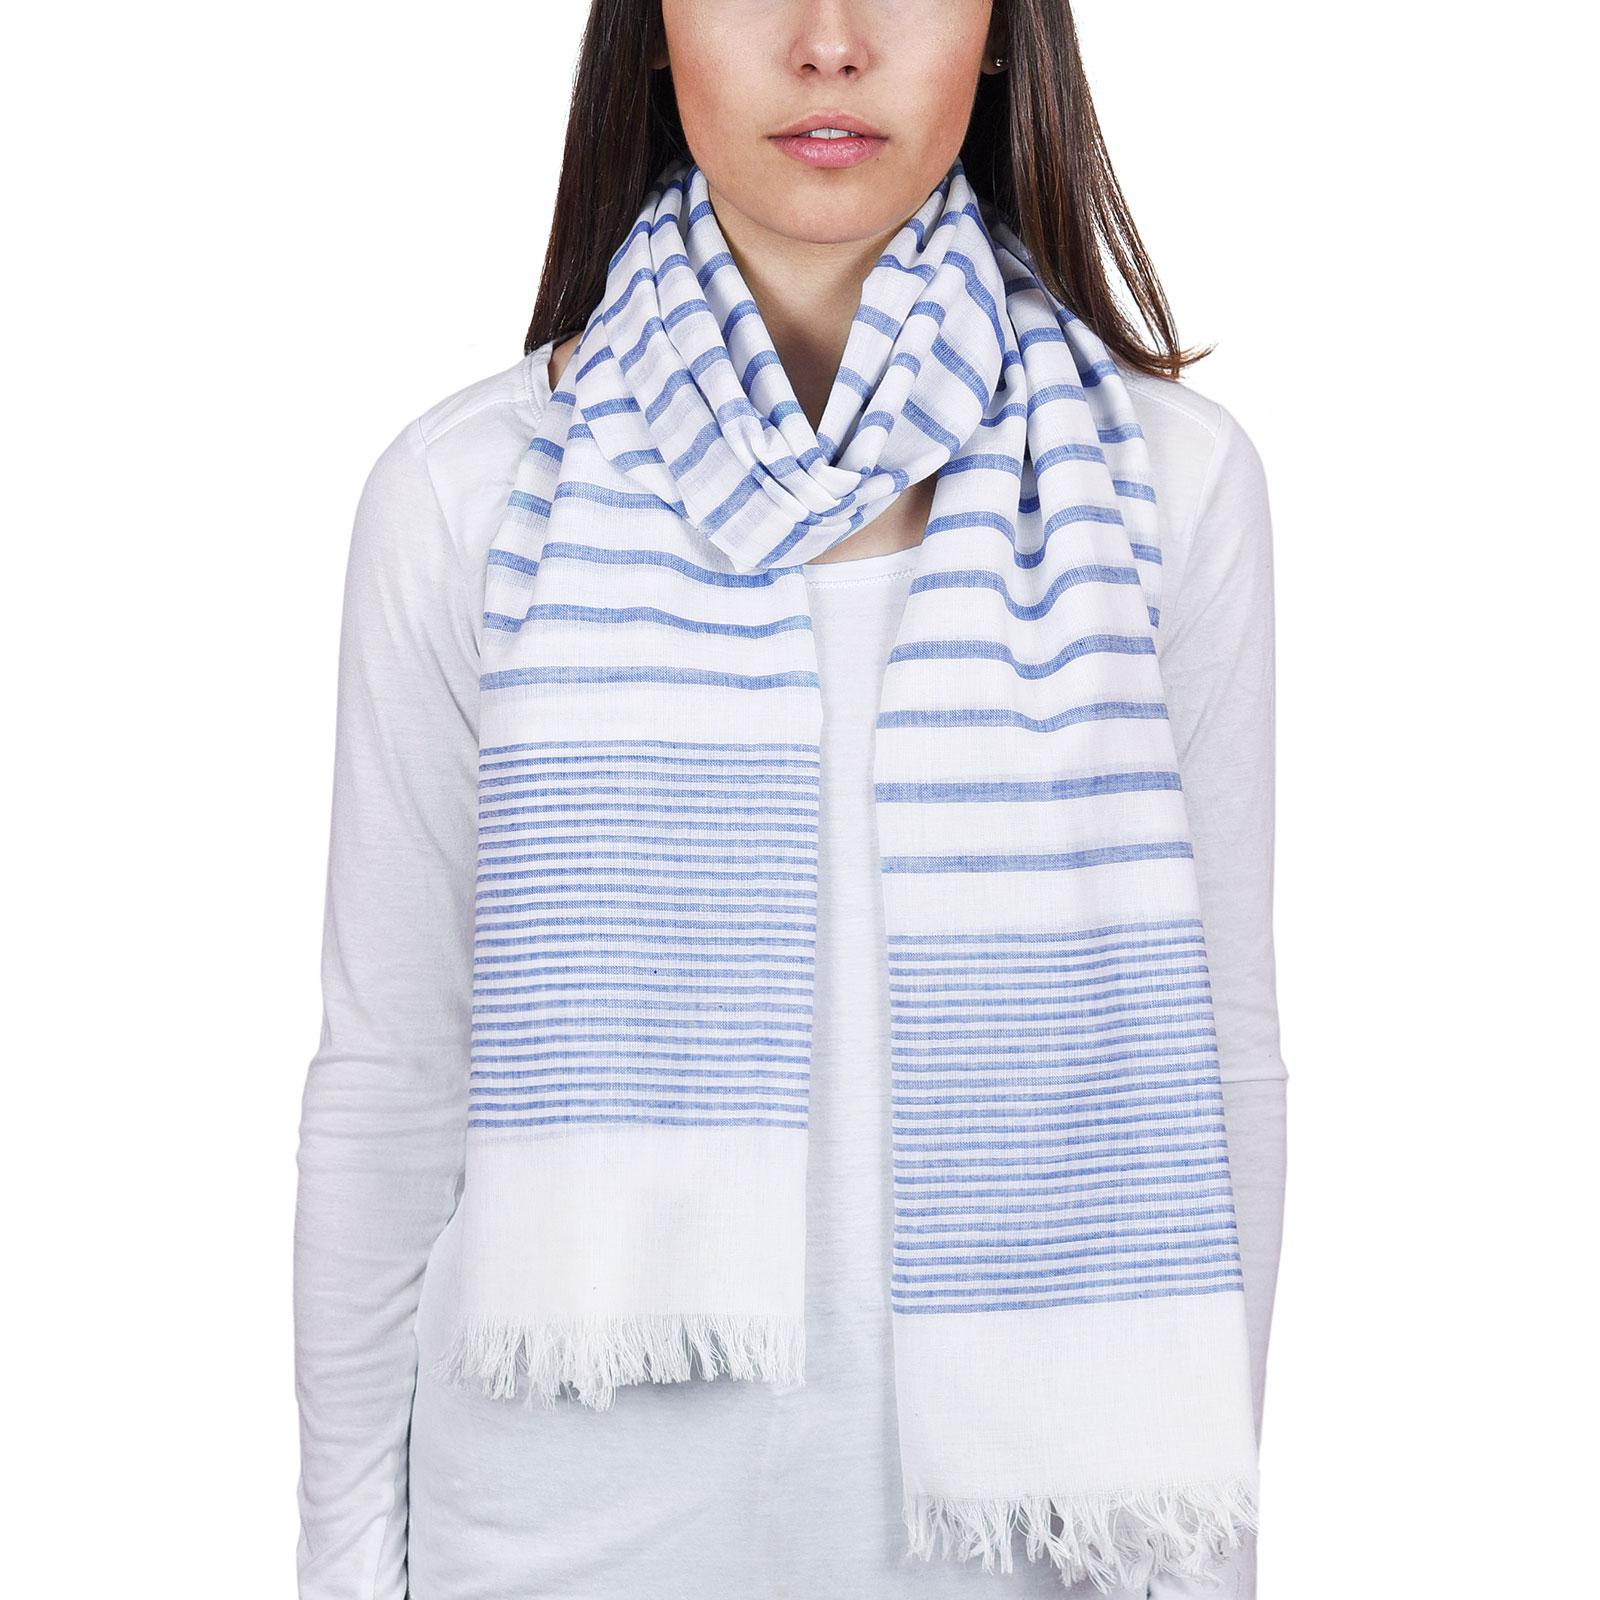 AT-04674-VF16-P-echarpe-coton-rayures-bleu